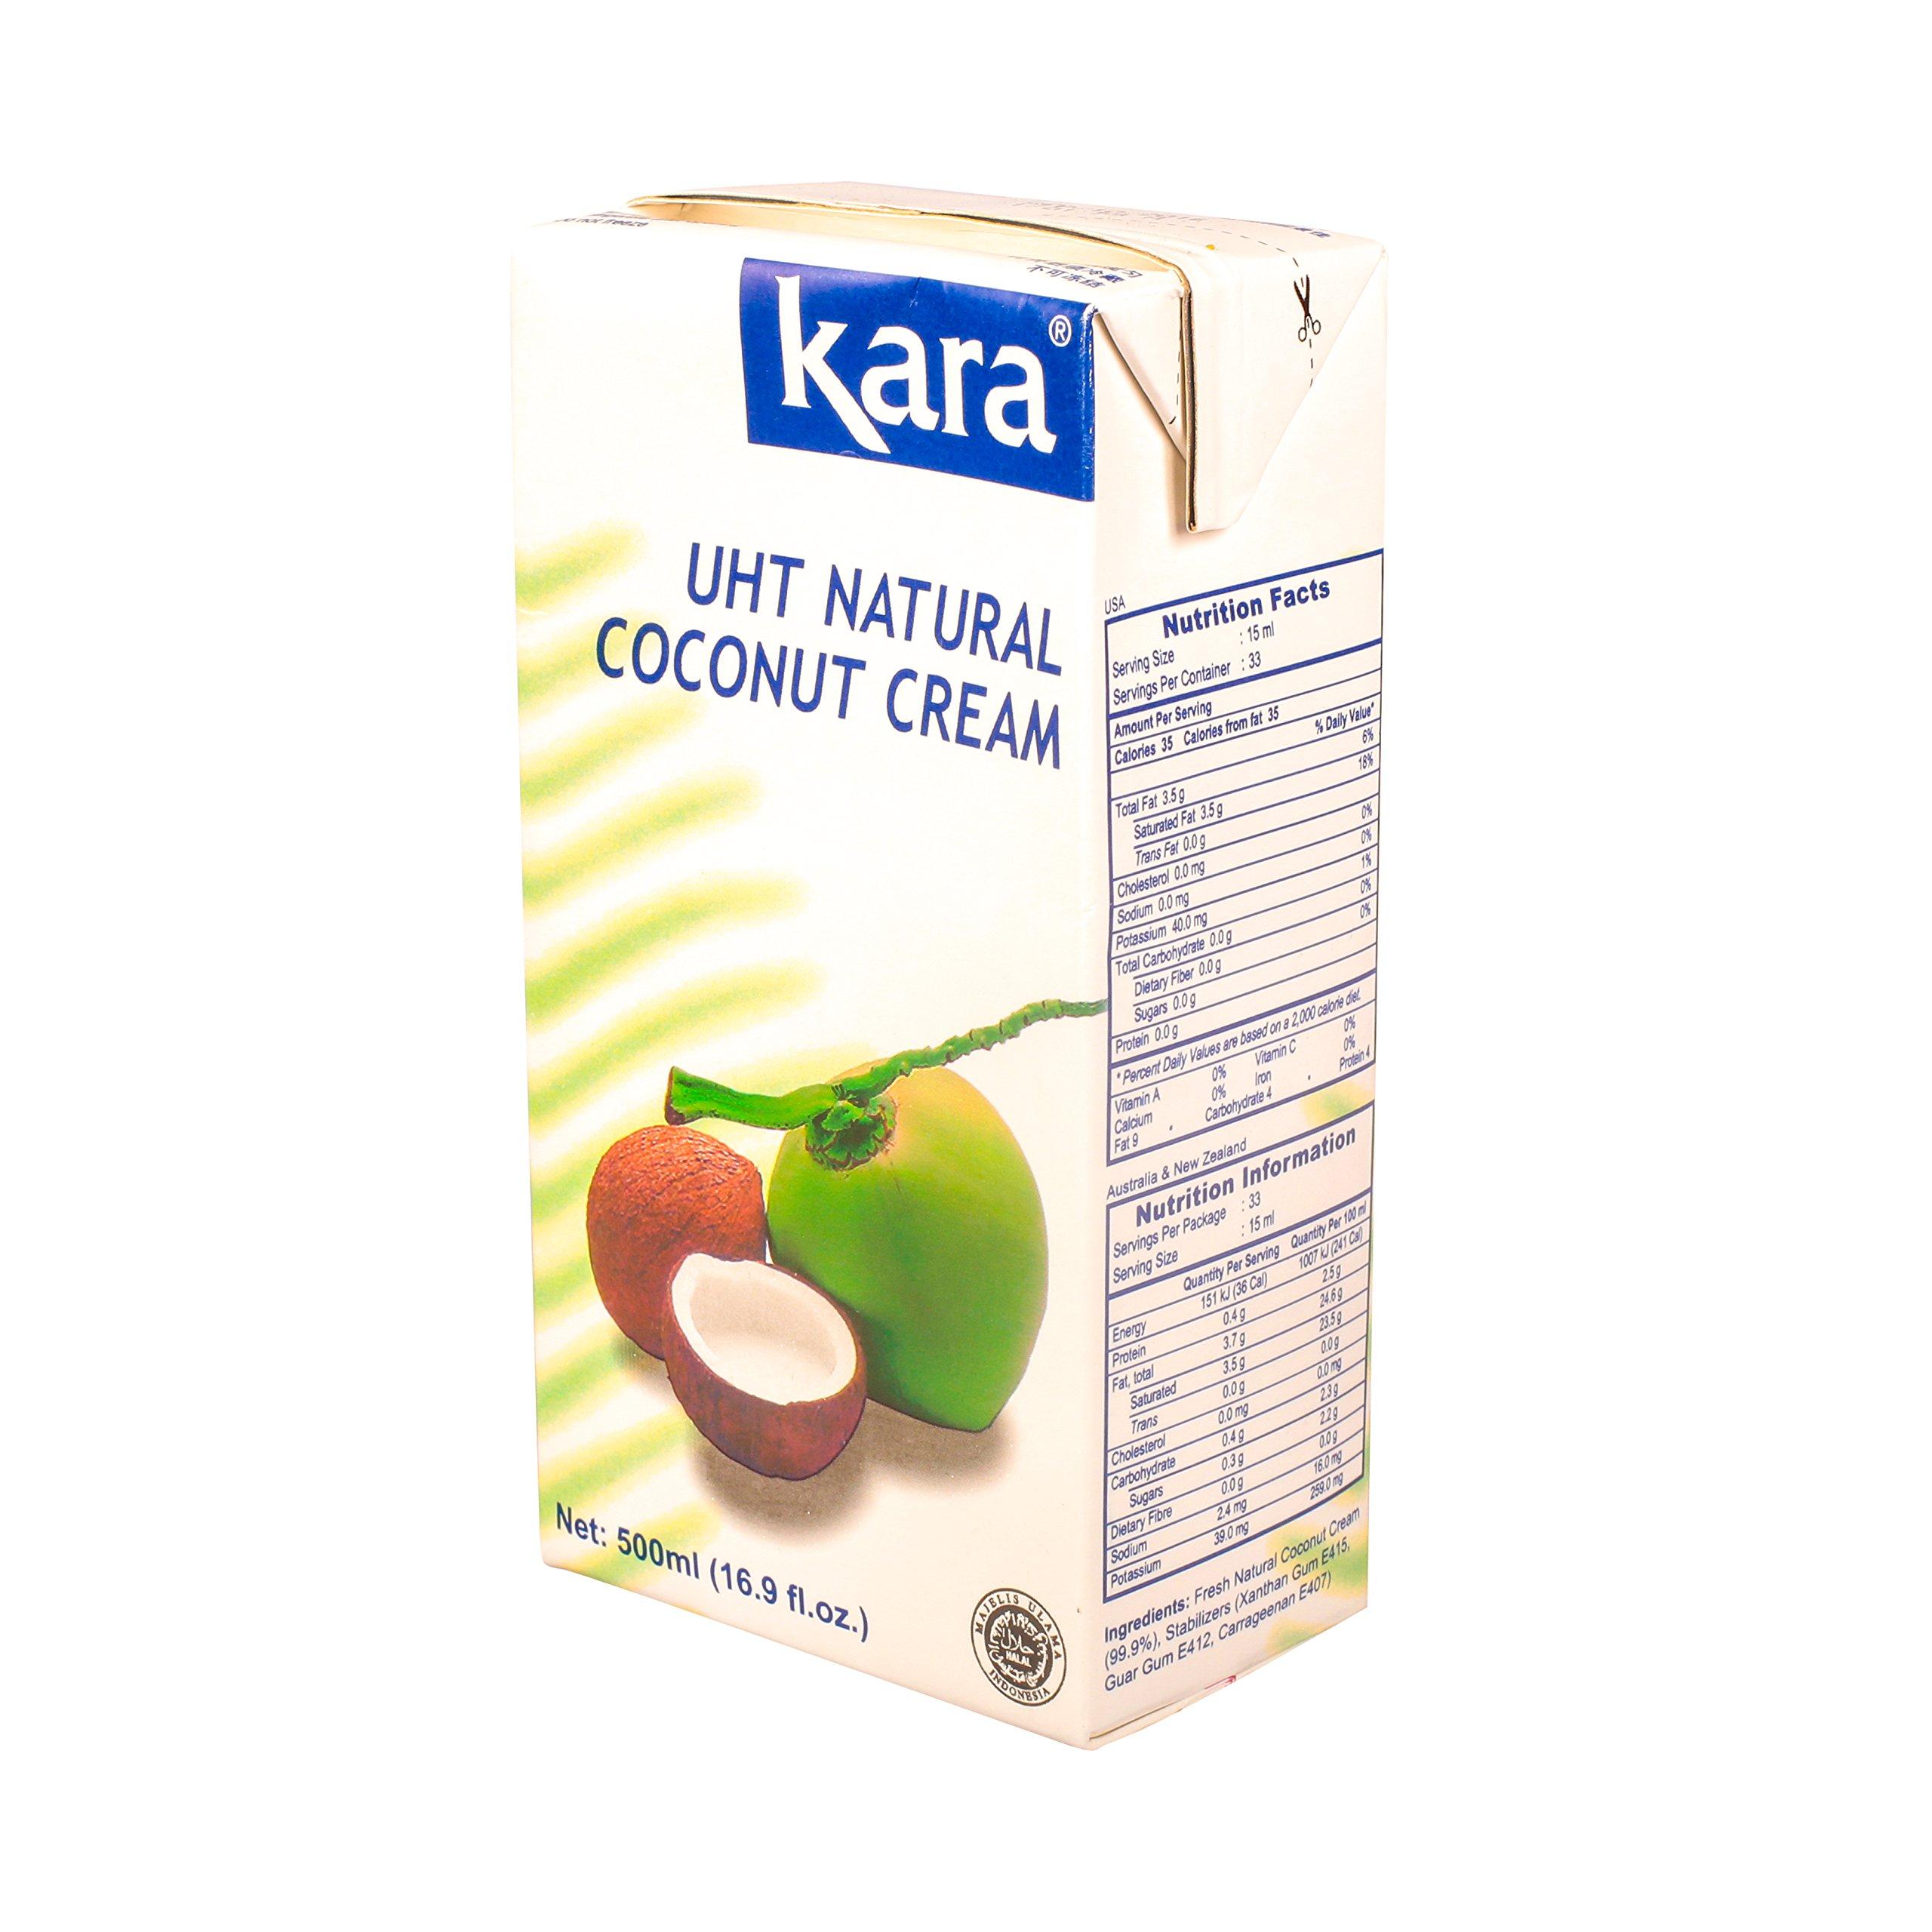 Kara UHT Coconut Cream (16.9 Oz. X 4)